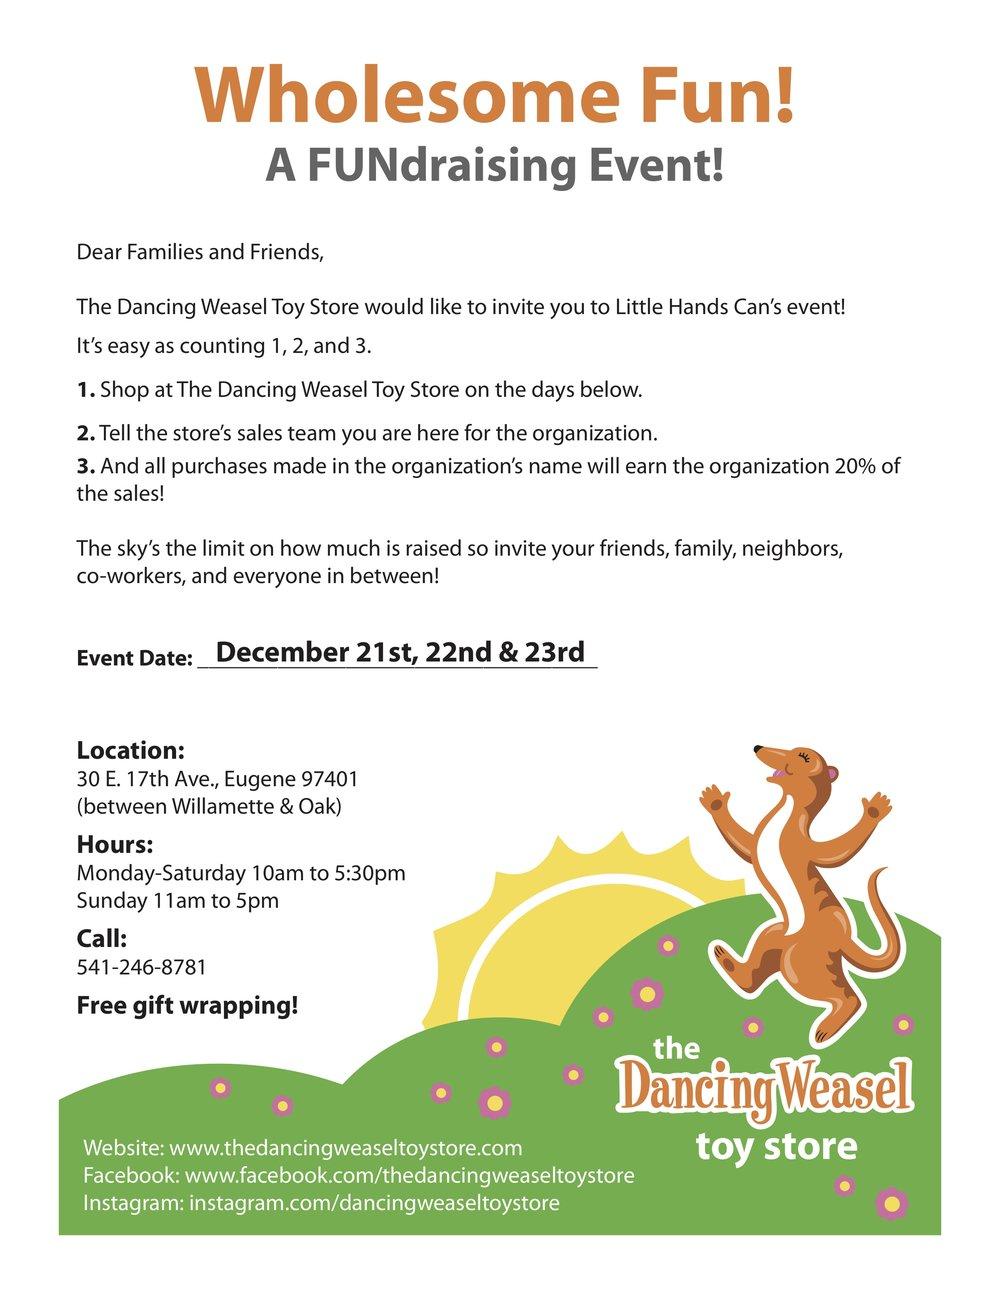 funraising-event-flyer.jpg